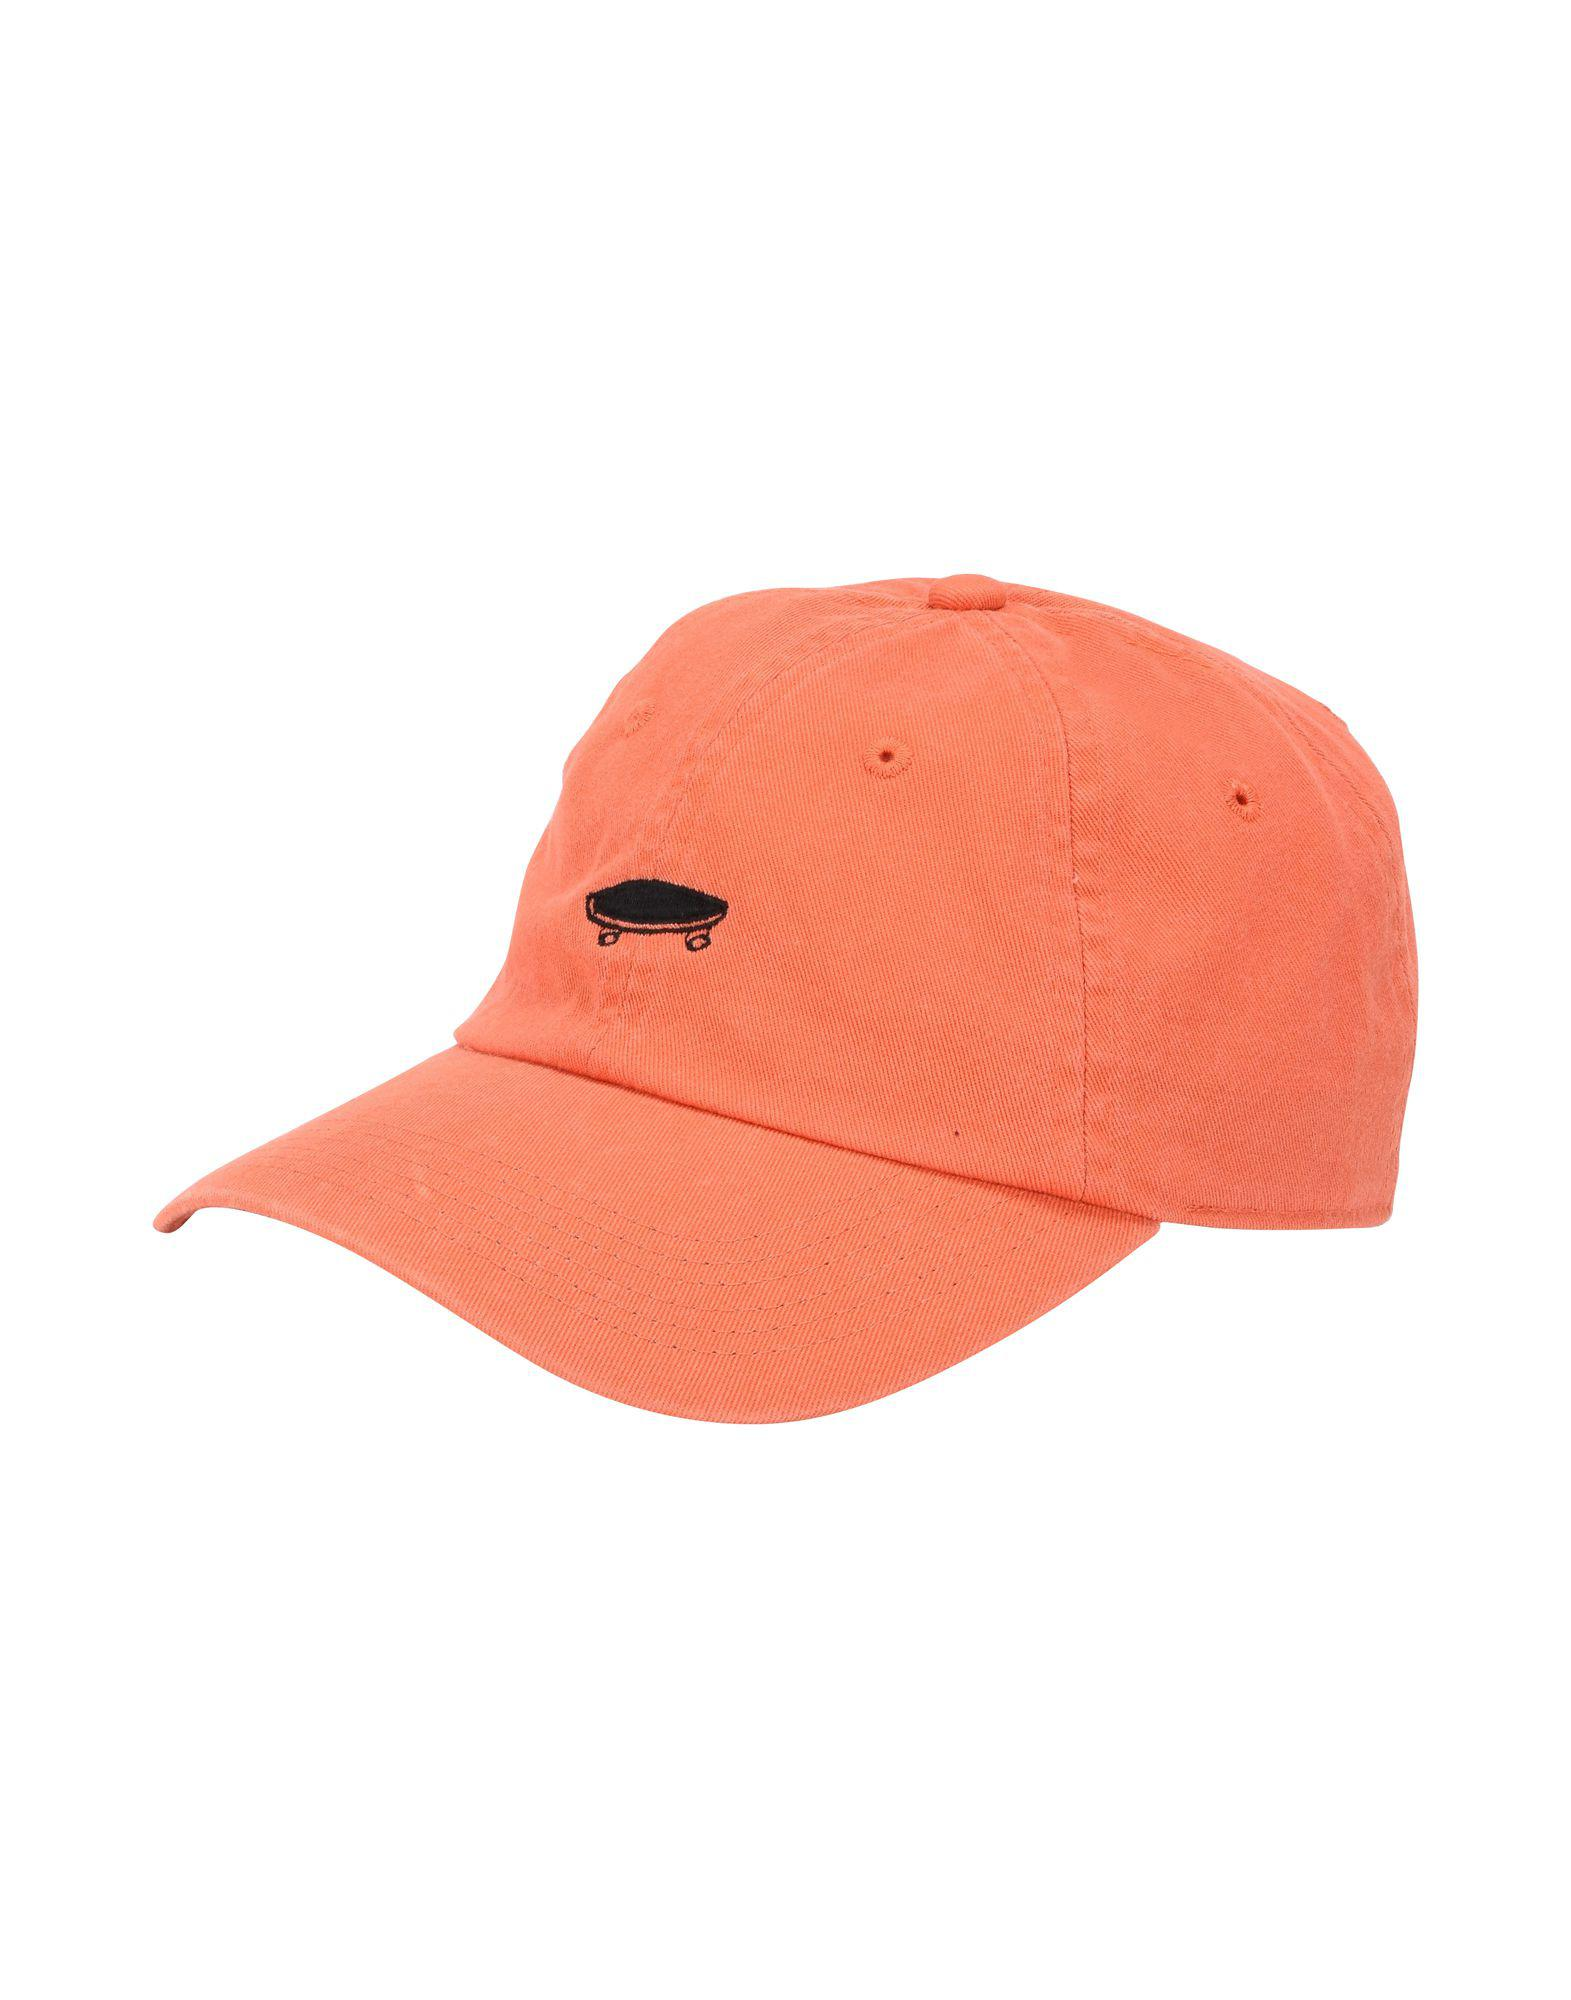 Vans Hat in Orange - Lyst 726600778f7